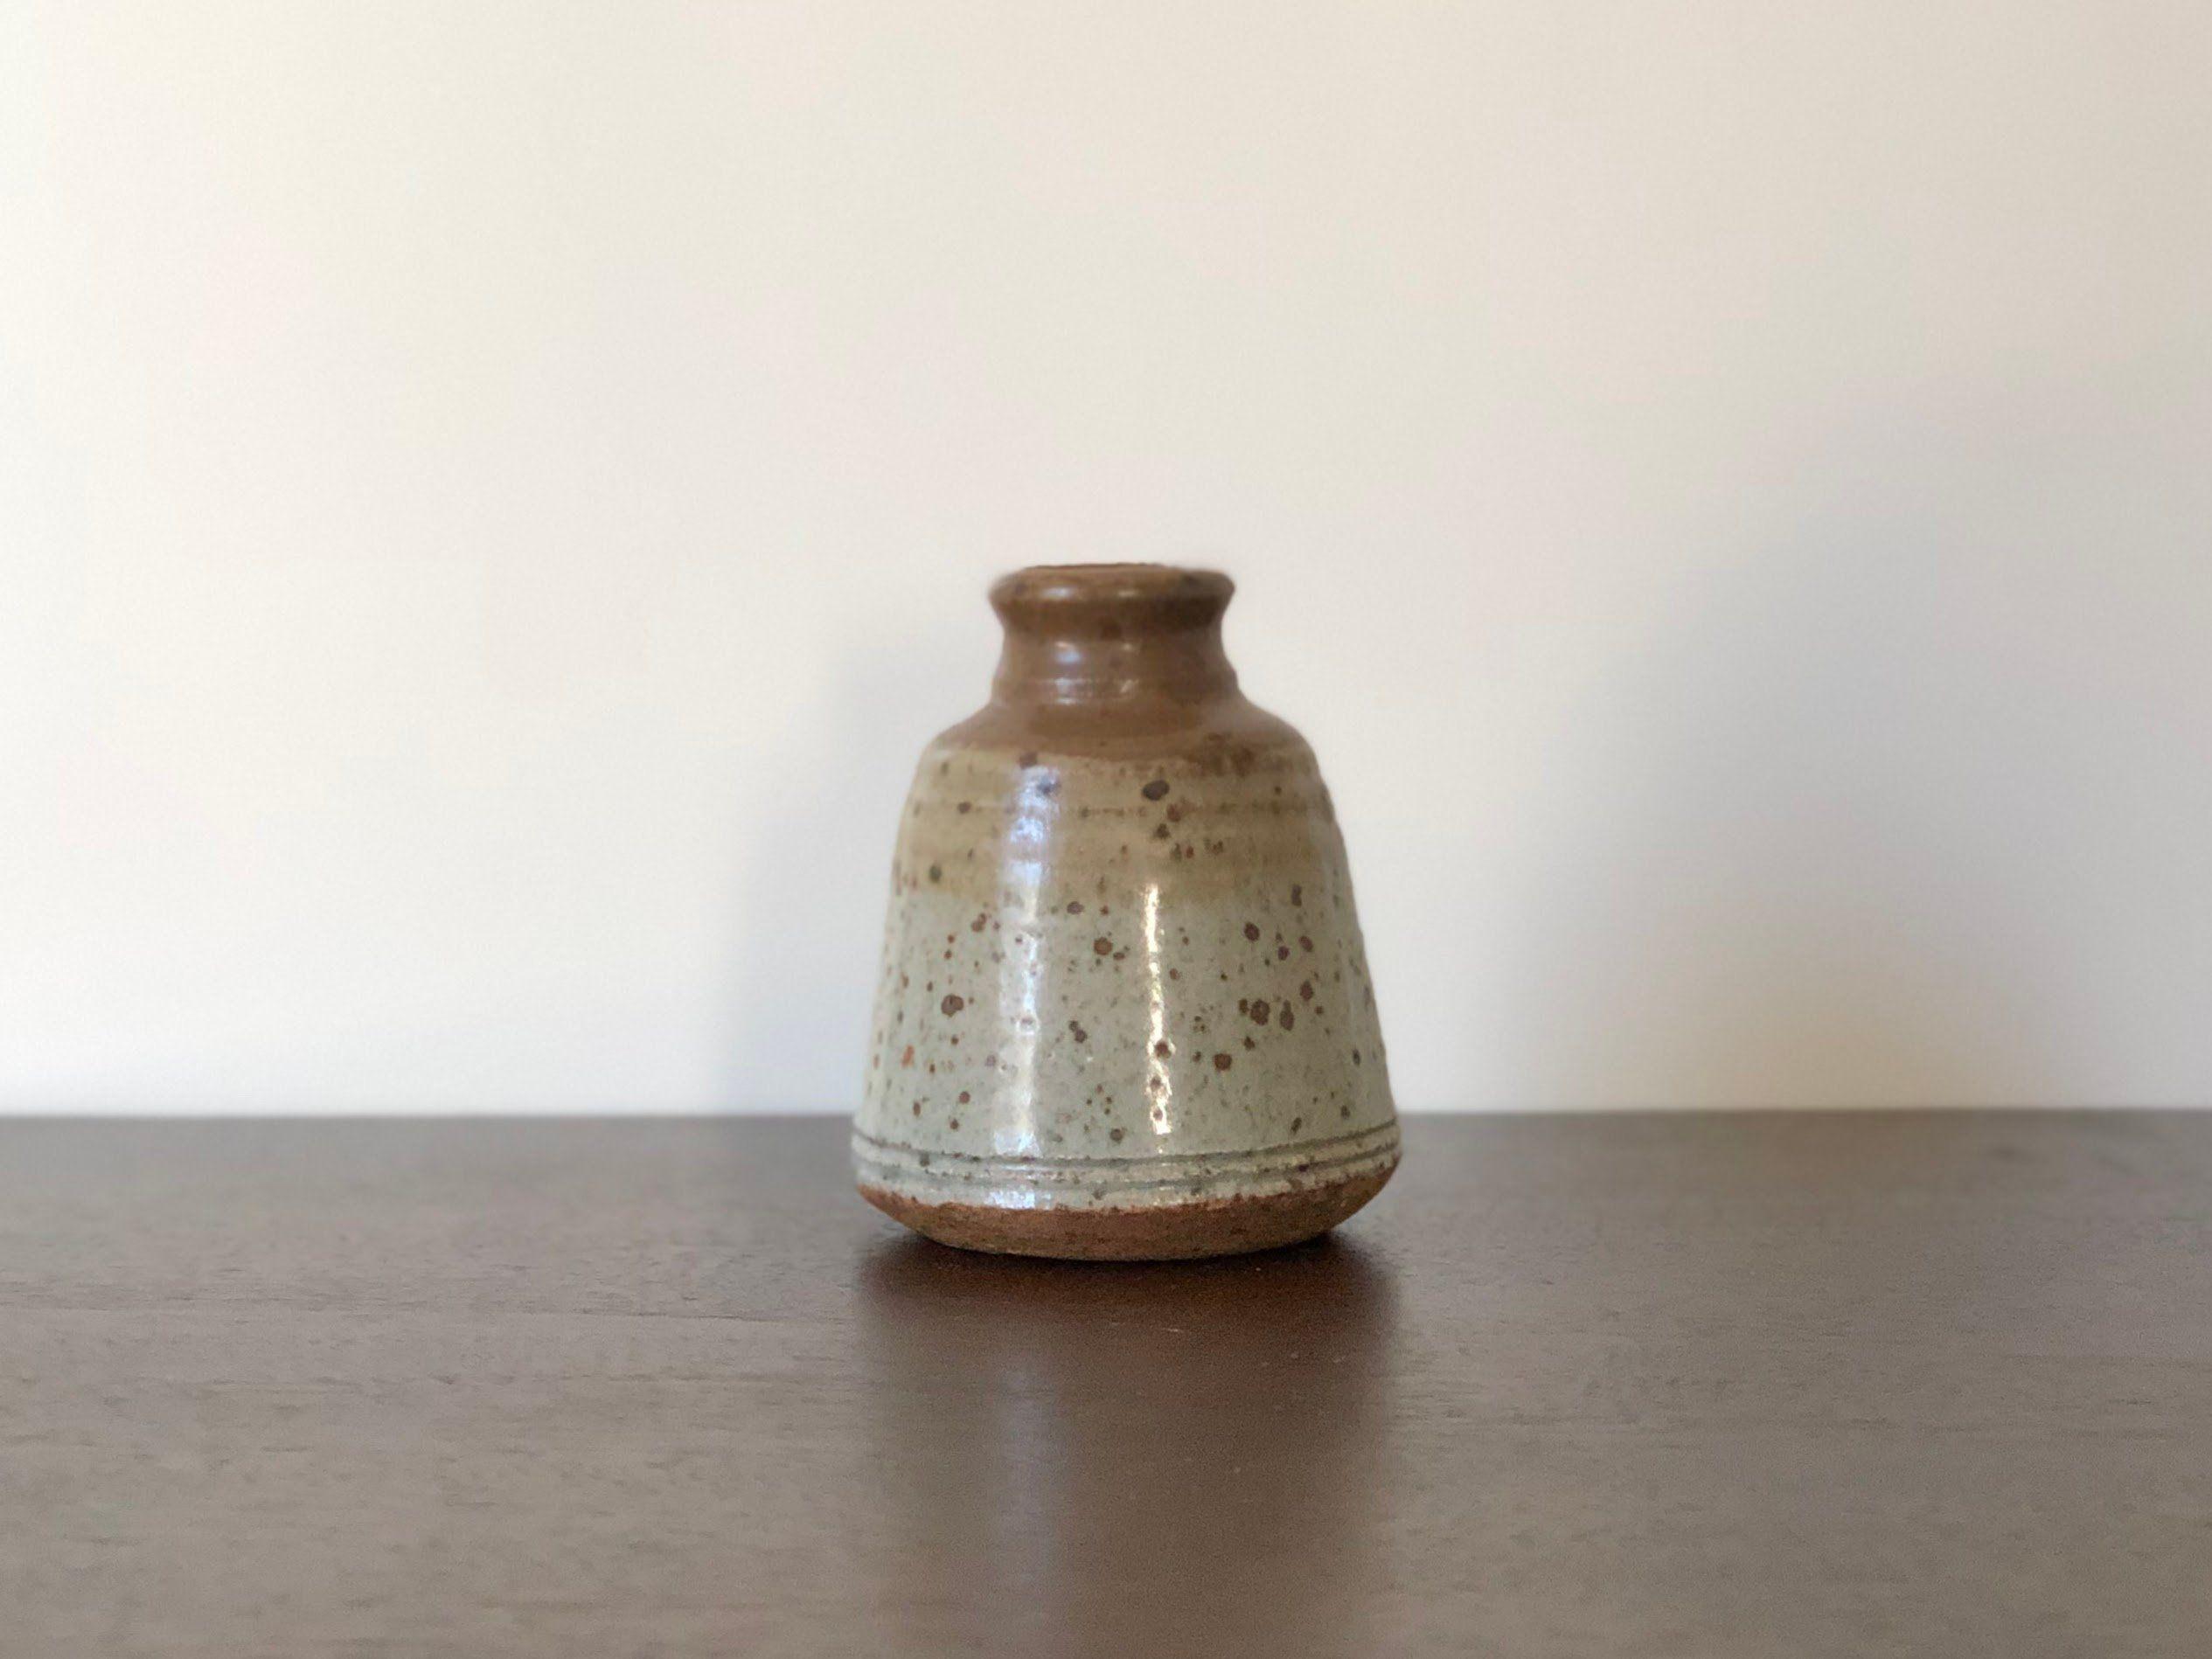 Ceramic Vase Stoneware Pottery Ceramic Vase Pottery Handmade Pottery